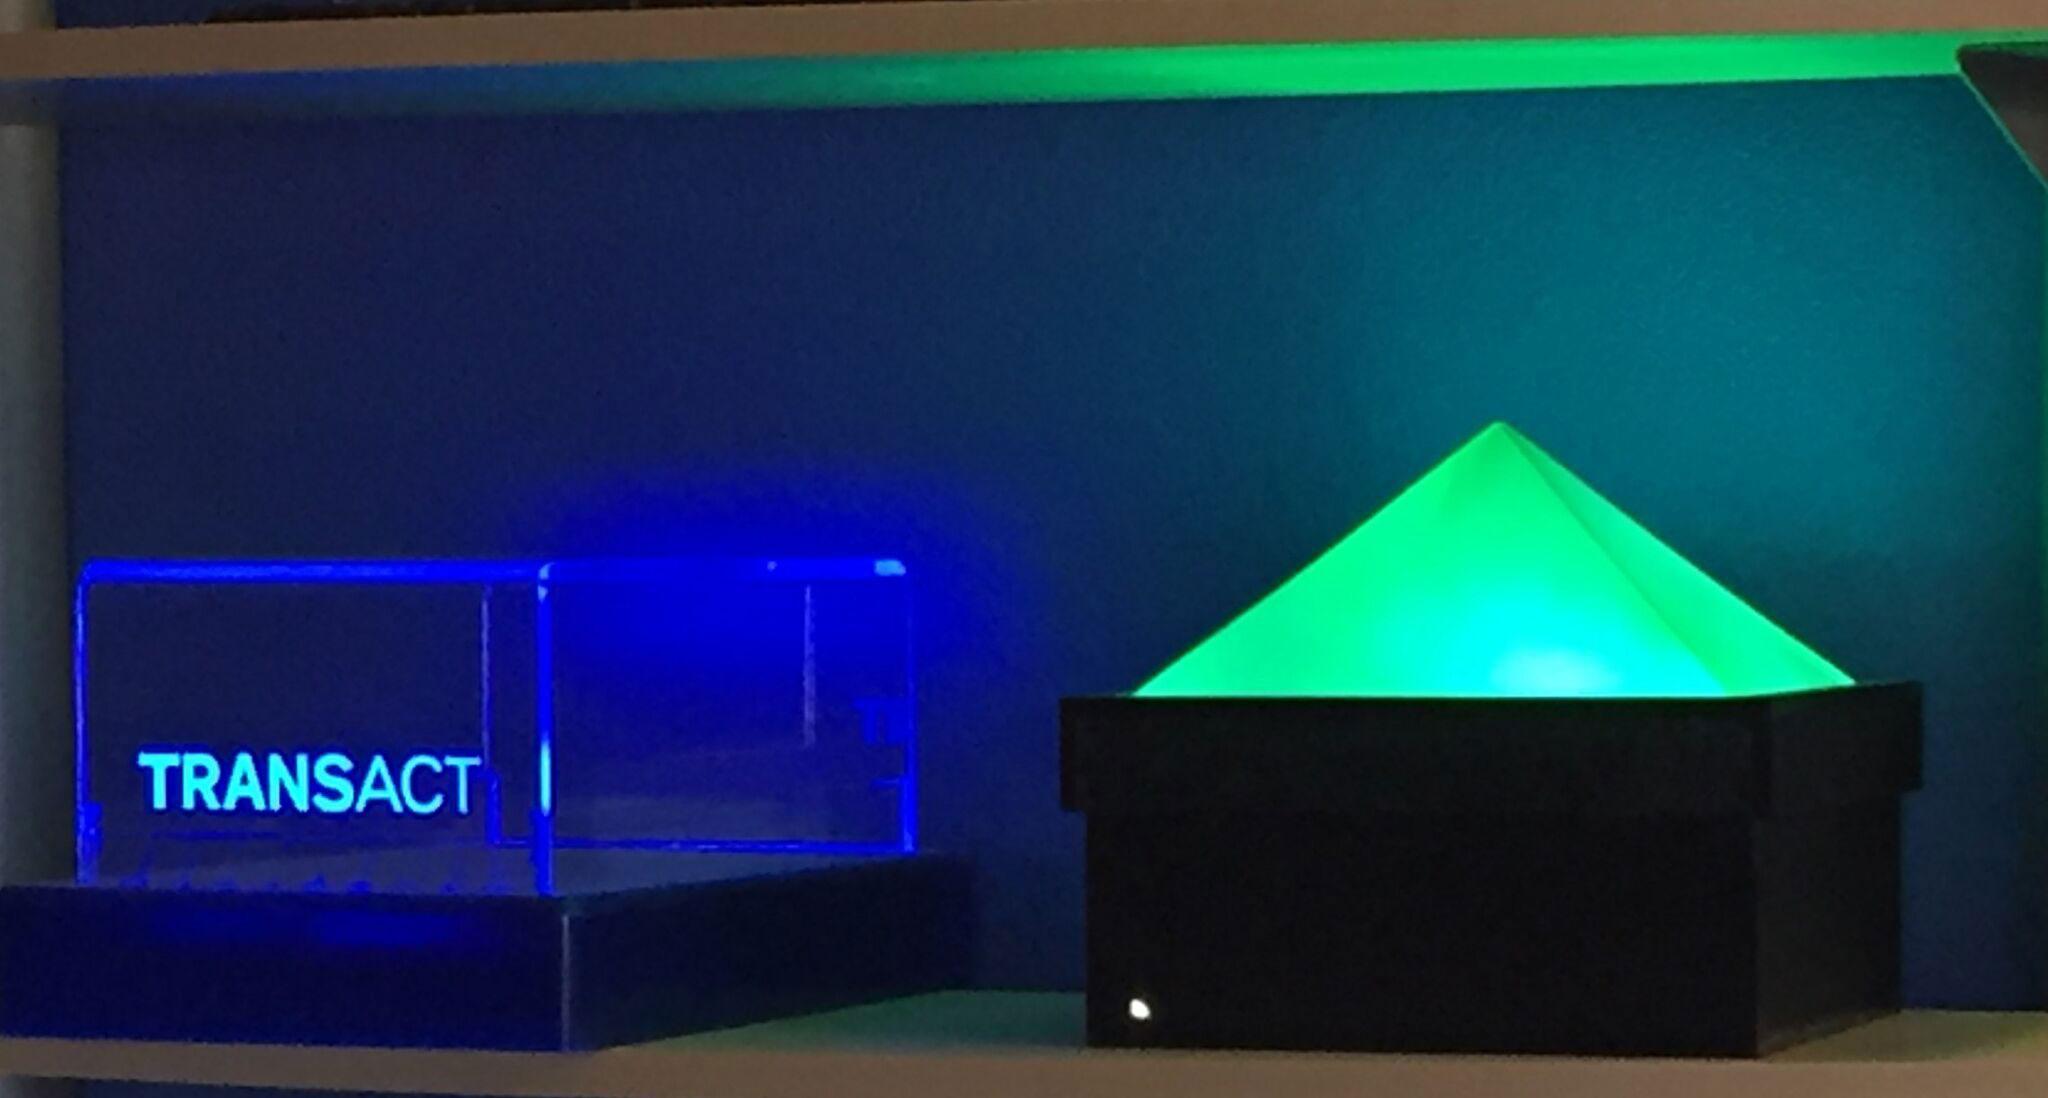 LED Displays Made of Plastic